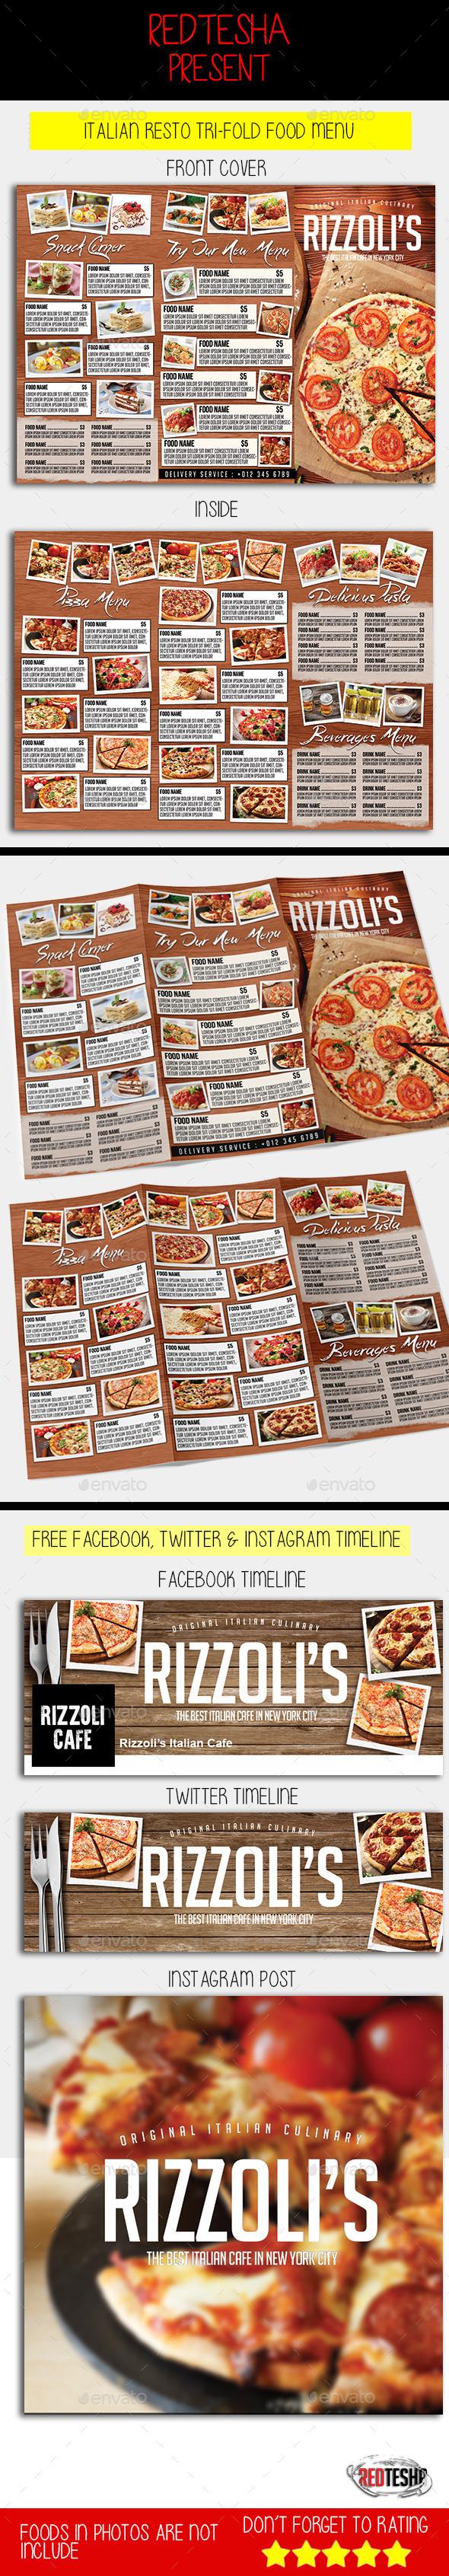 Italian Tri-fold Menu - Food Menus Print Templates